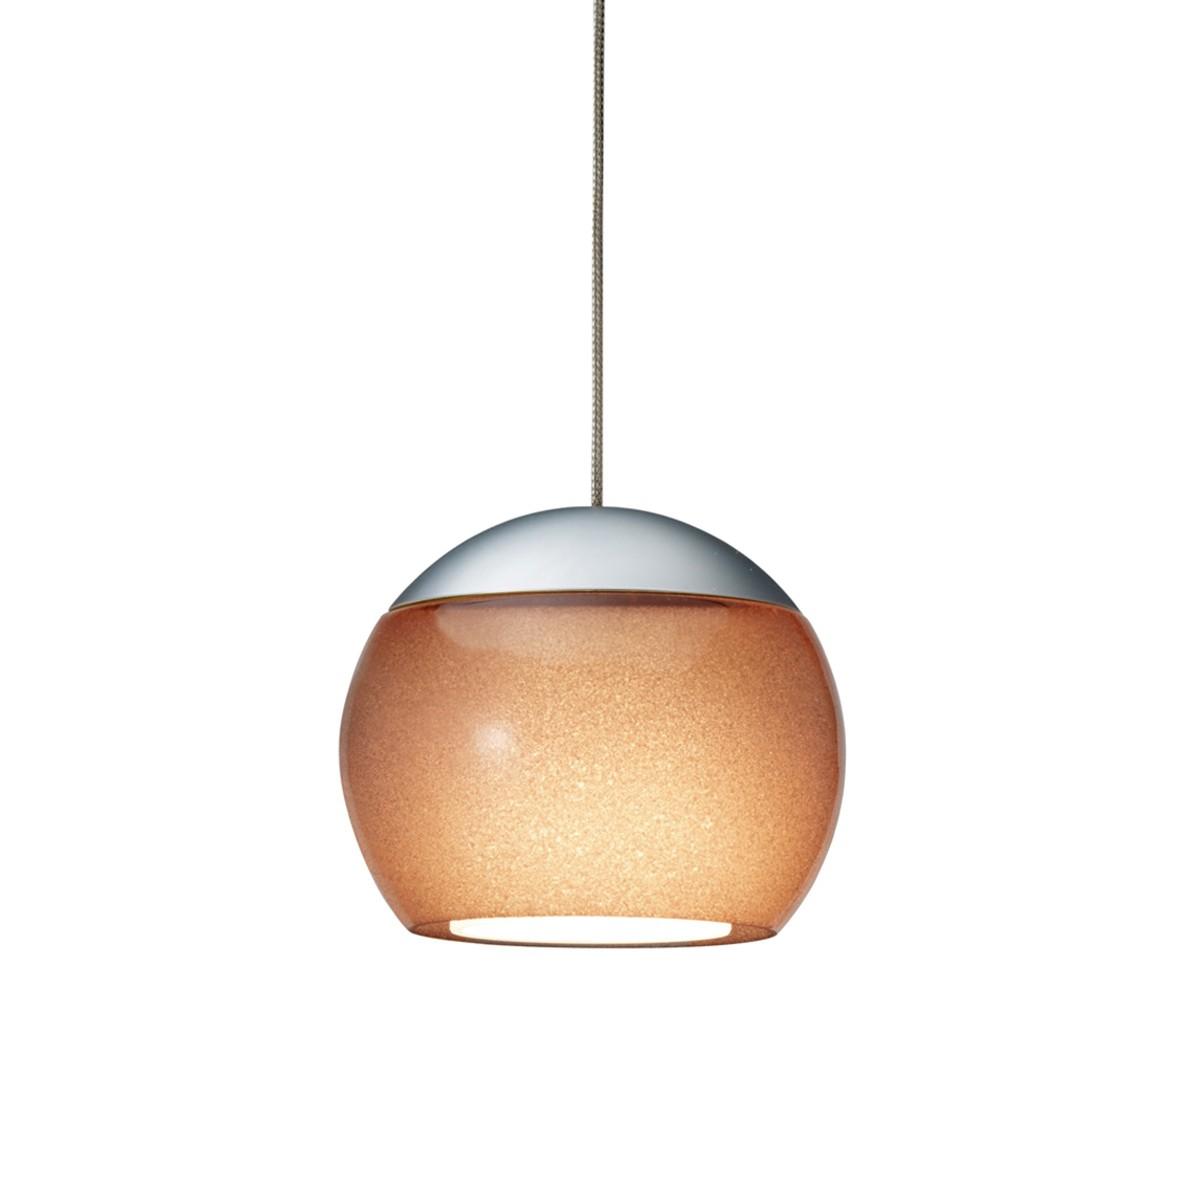 Oligo Balino LED Pendelleuchte, Chrom matt / Tabak glänzend